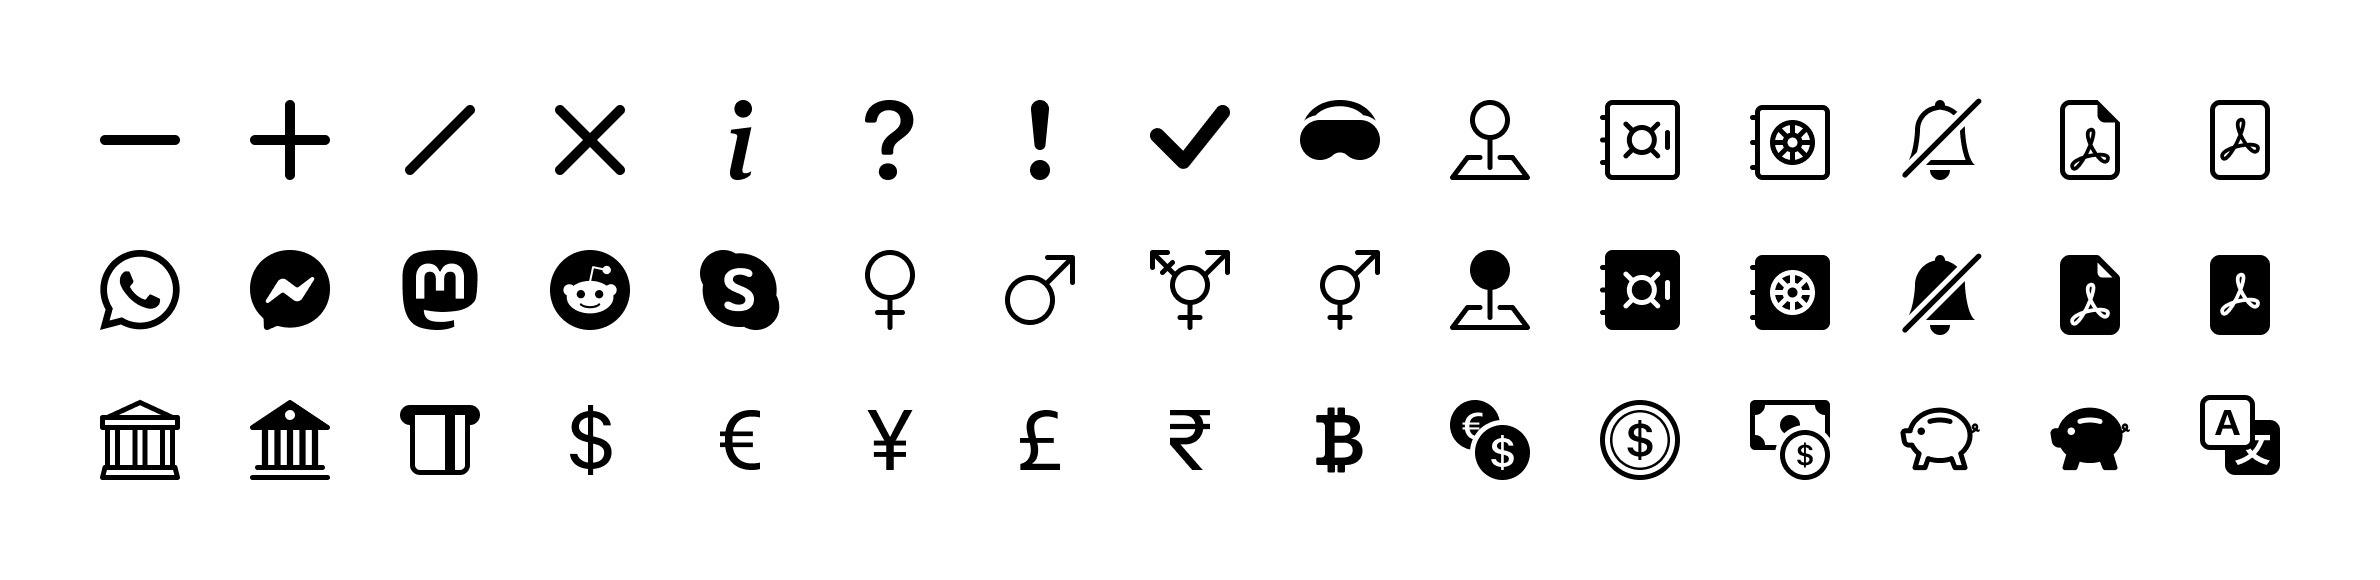 Boostrap 5 ikony